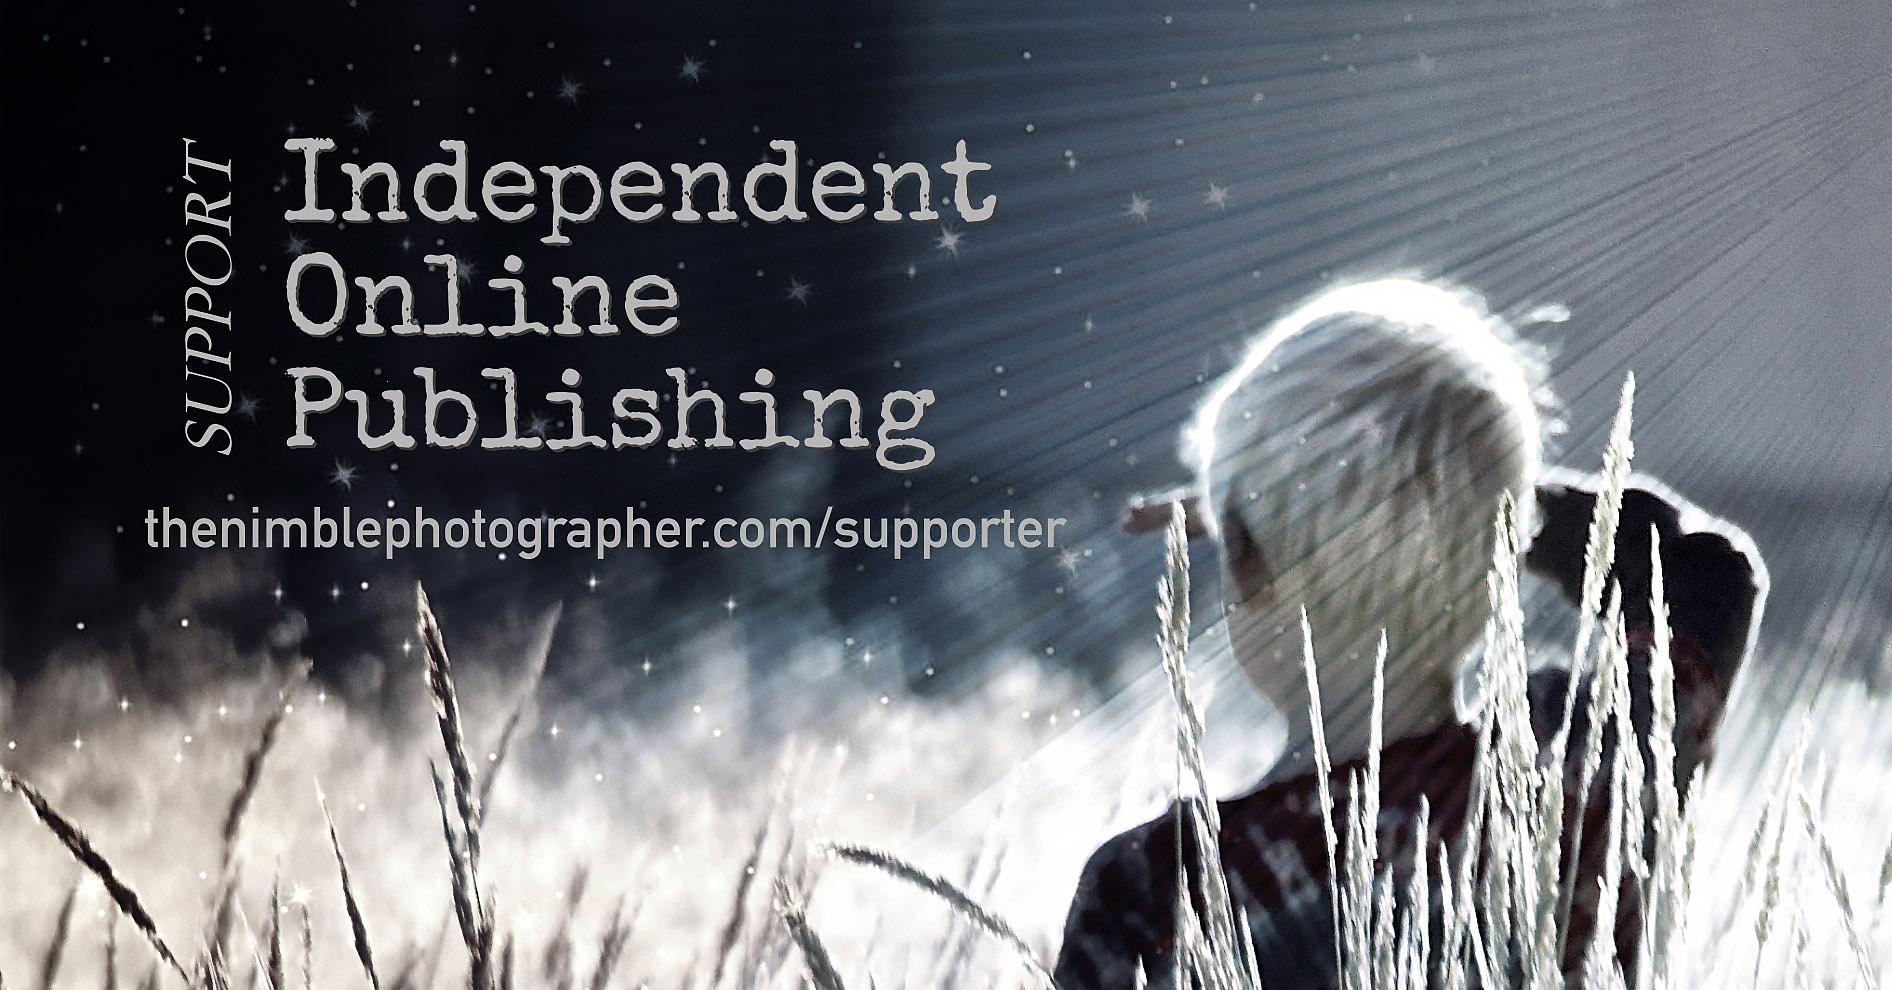 http://thedigitalstory.com/2015/10/22/support-online-pub-horz-rec.jpg